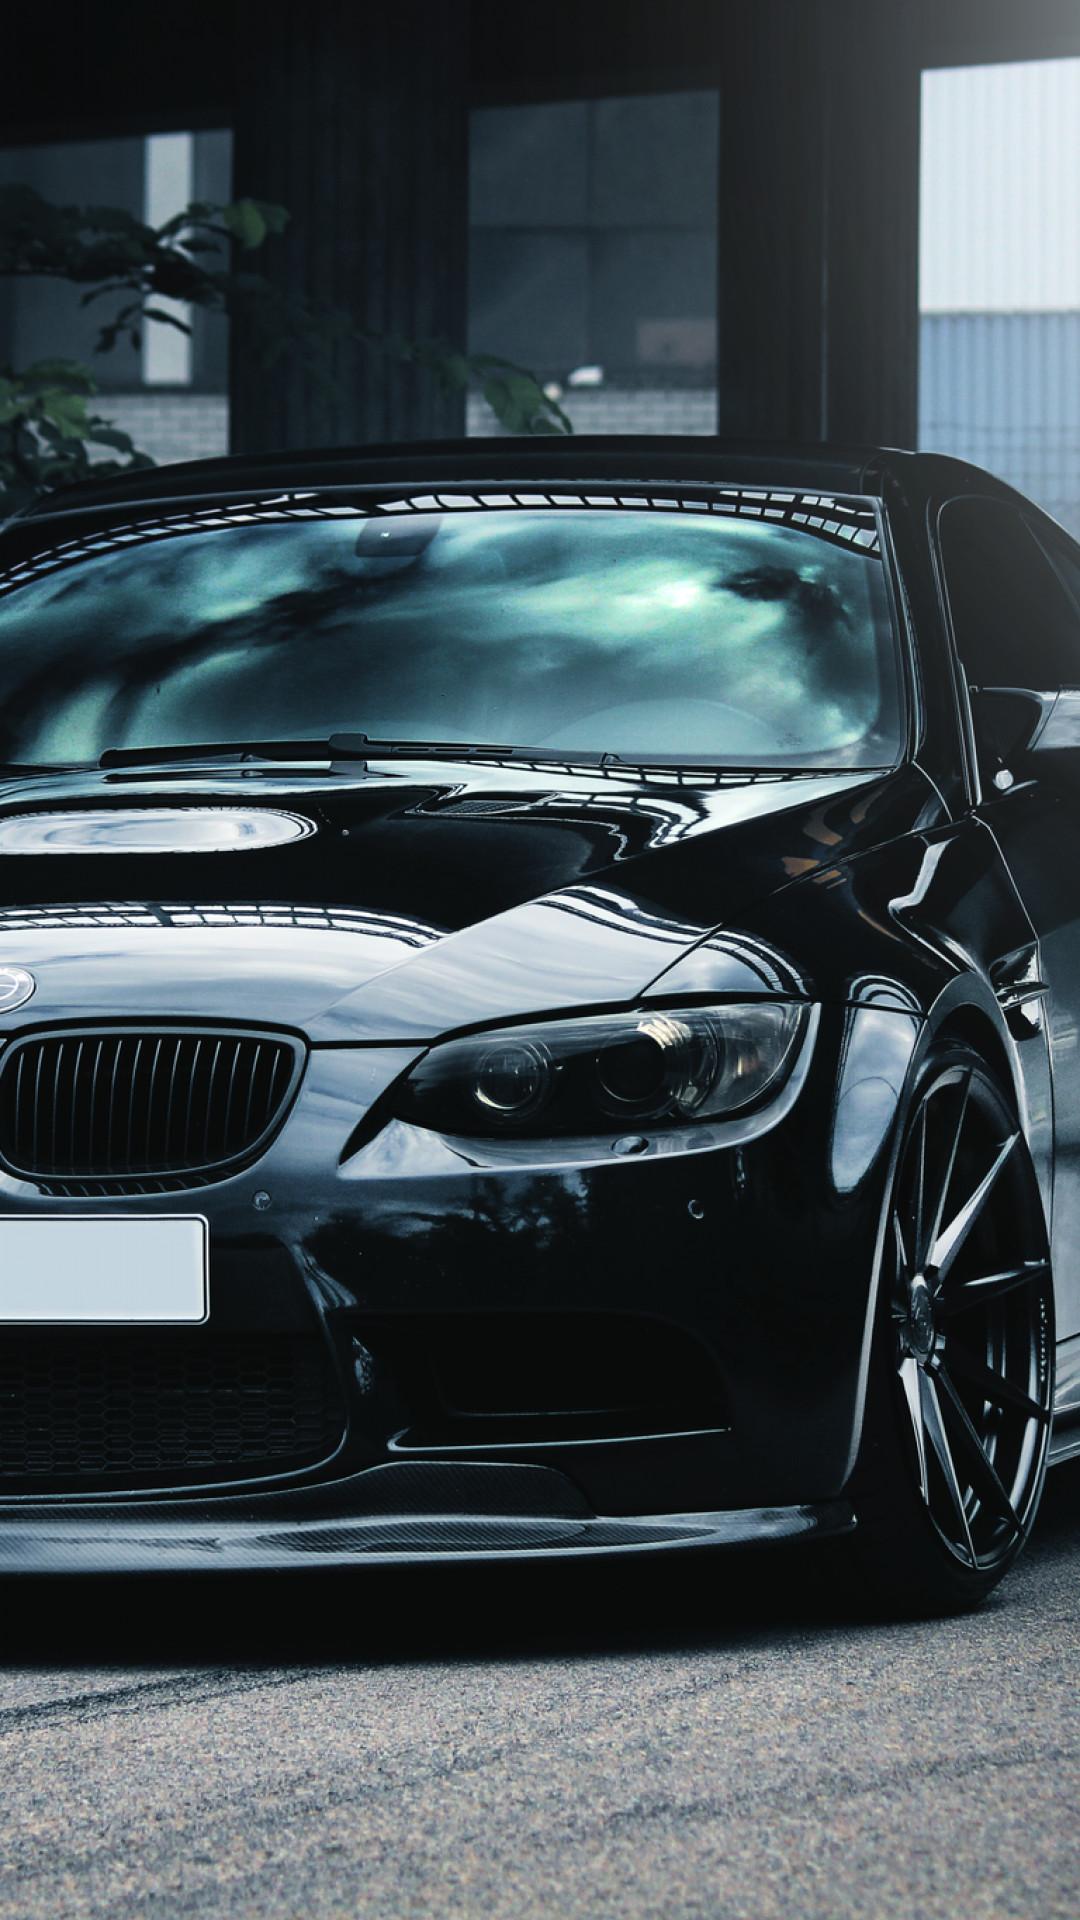 Car Iphone Black Bmw Wallpaper